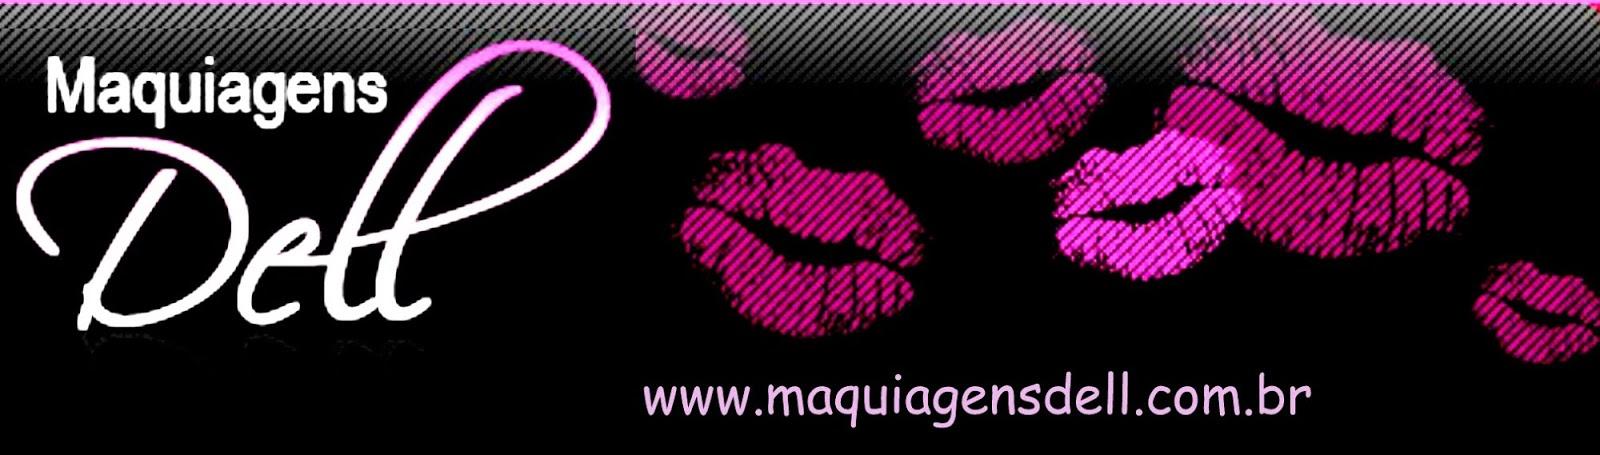 http://www.maquiagensdell.com.br/